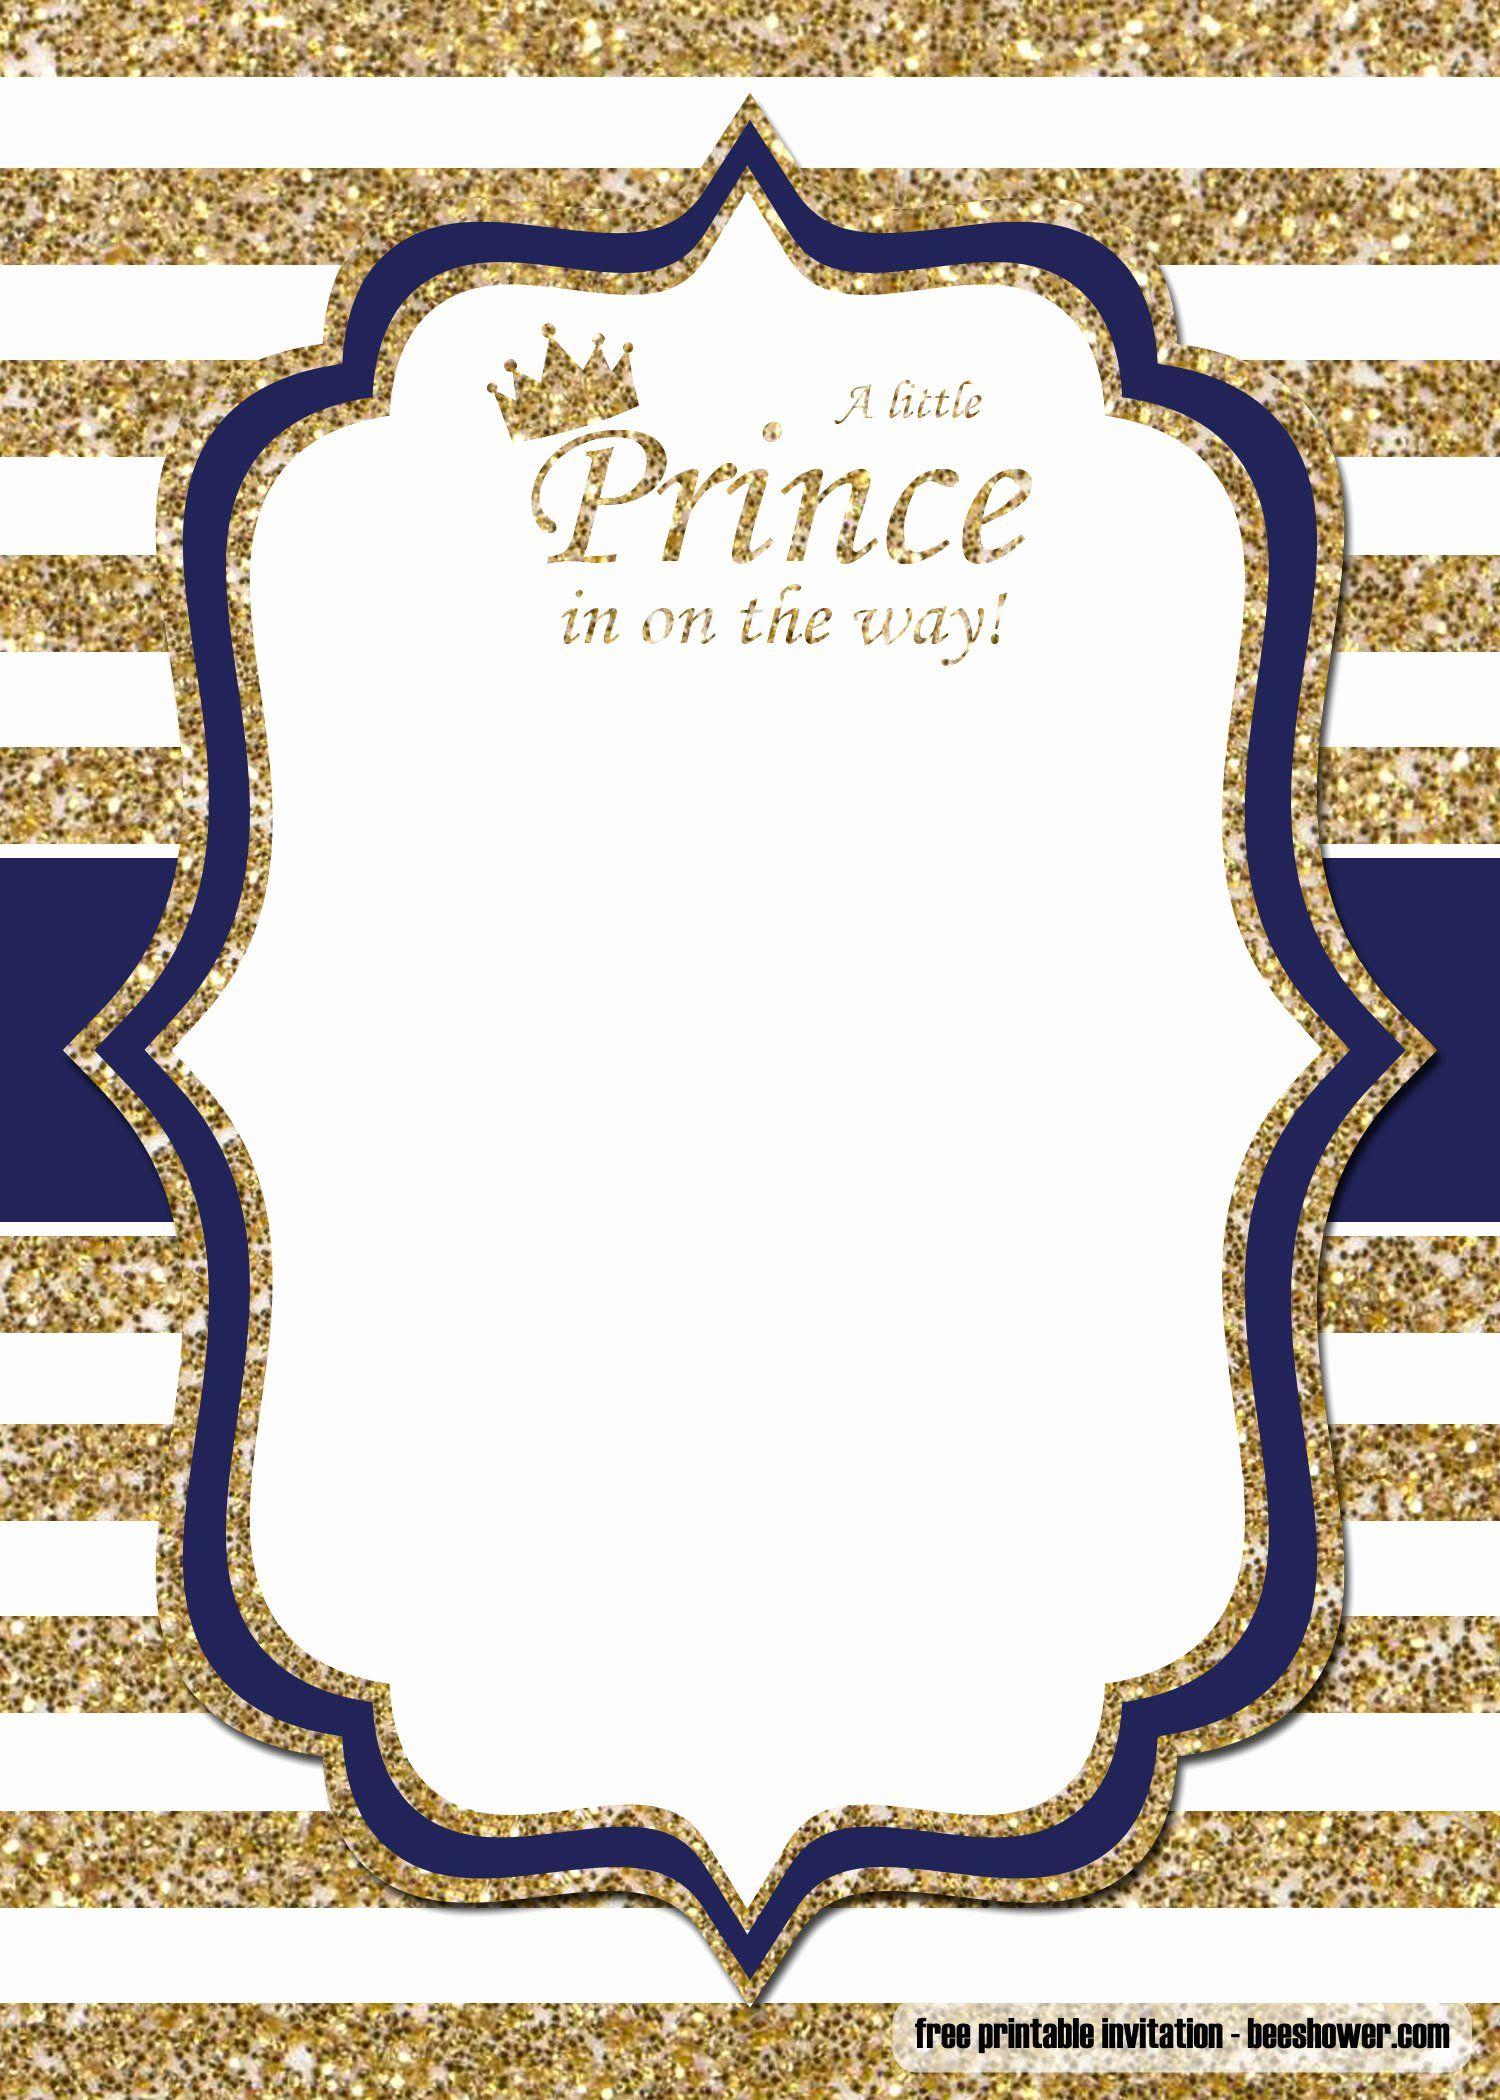 Royal Baby Shower Invitation New Free Prince Baby Shower Invitatio Royal Baby Shower Invitation Prince Baby Shower Invitations Baby Shower Invitation Templates Royal baby shower invitation template